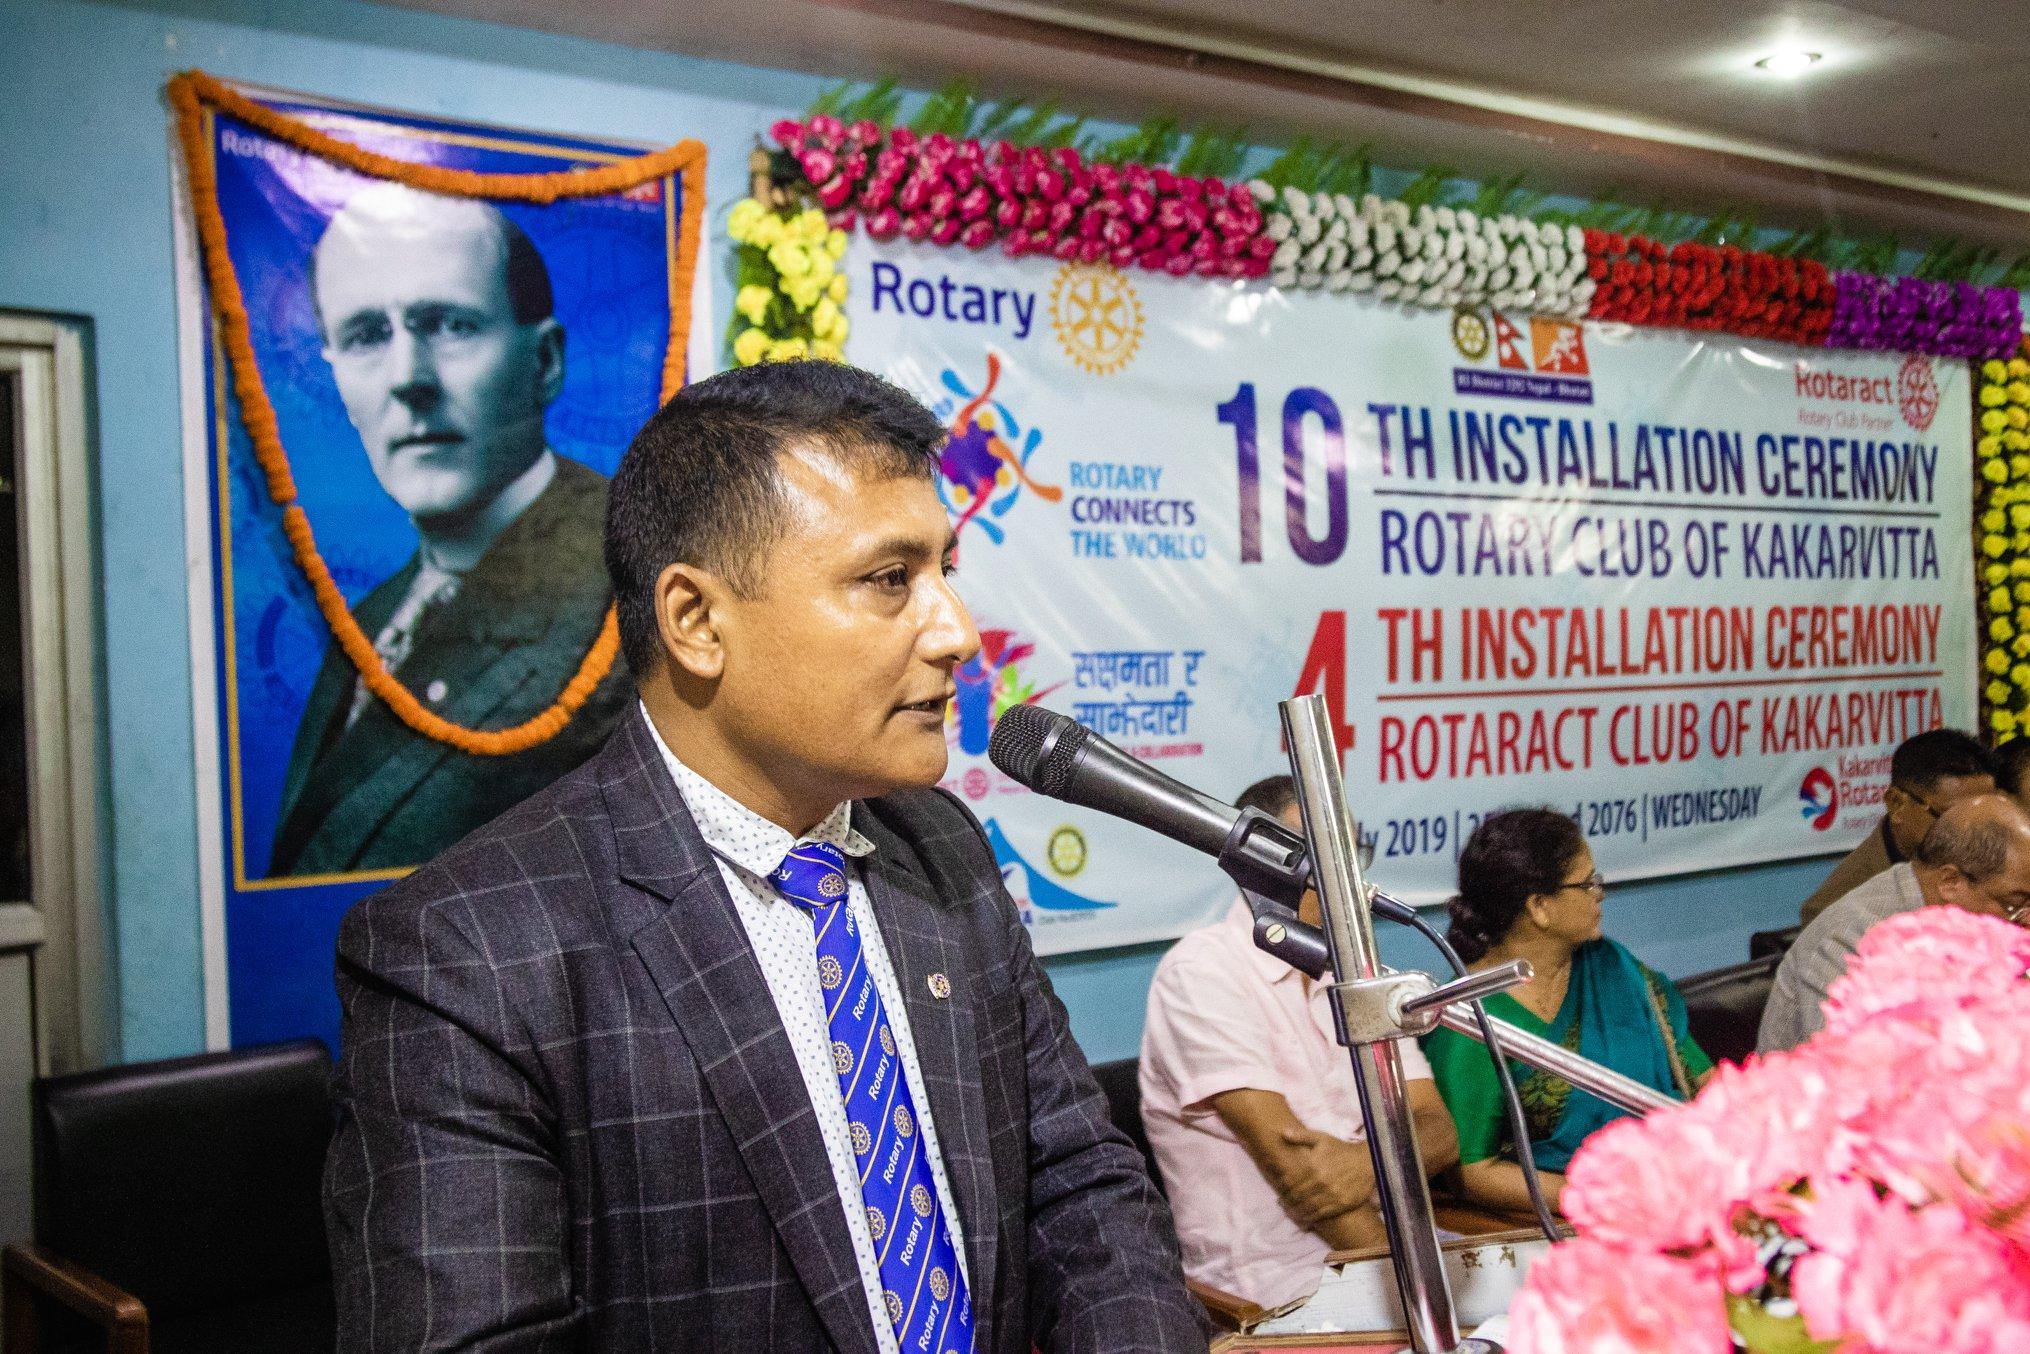 10th Installation Ceremony Rotary Club Of Kakarvitta 35